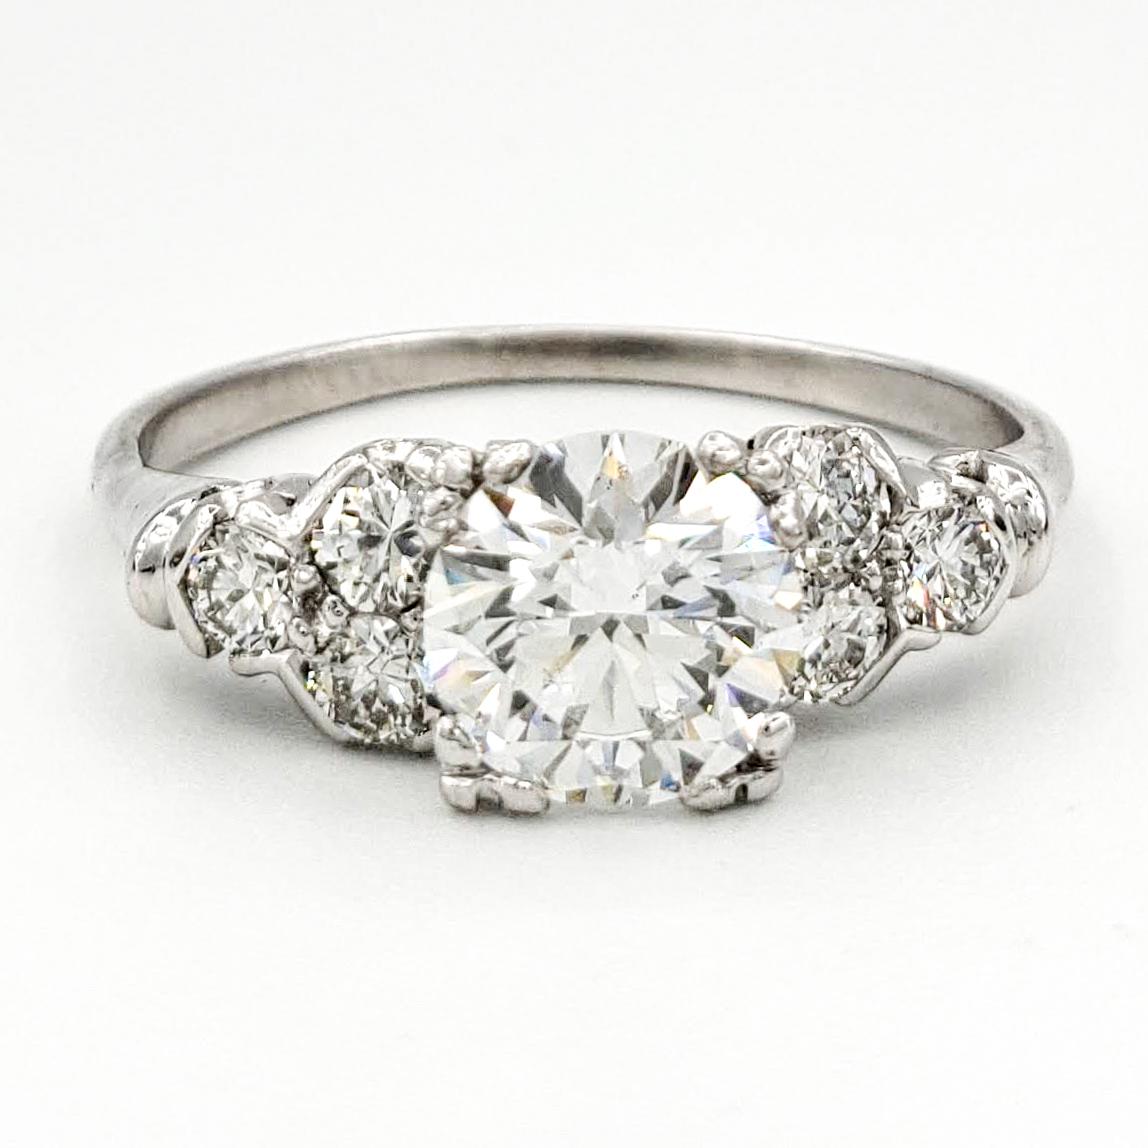 vintage-platinum-engagement-ring-with-1-00-carat-round-brilliant-cut-diamond-gia-e-si1